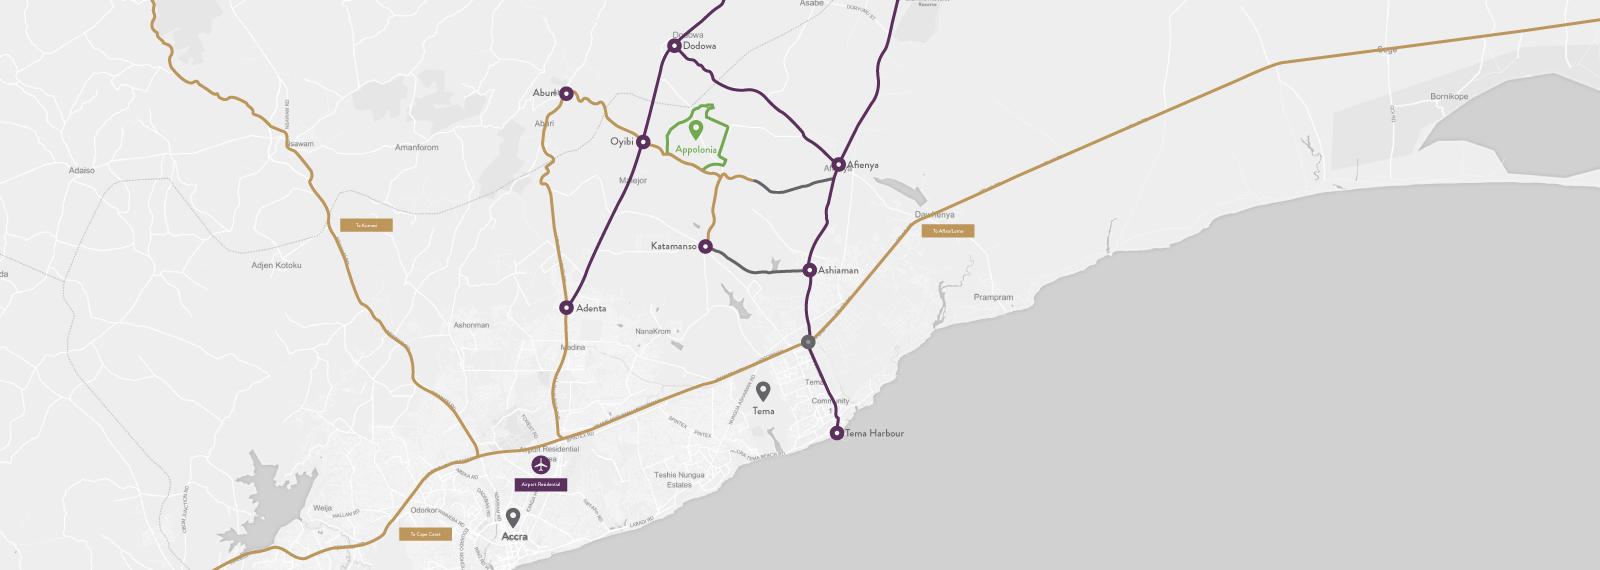 Appolonia City map